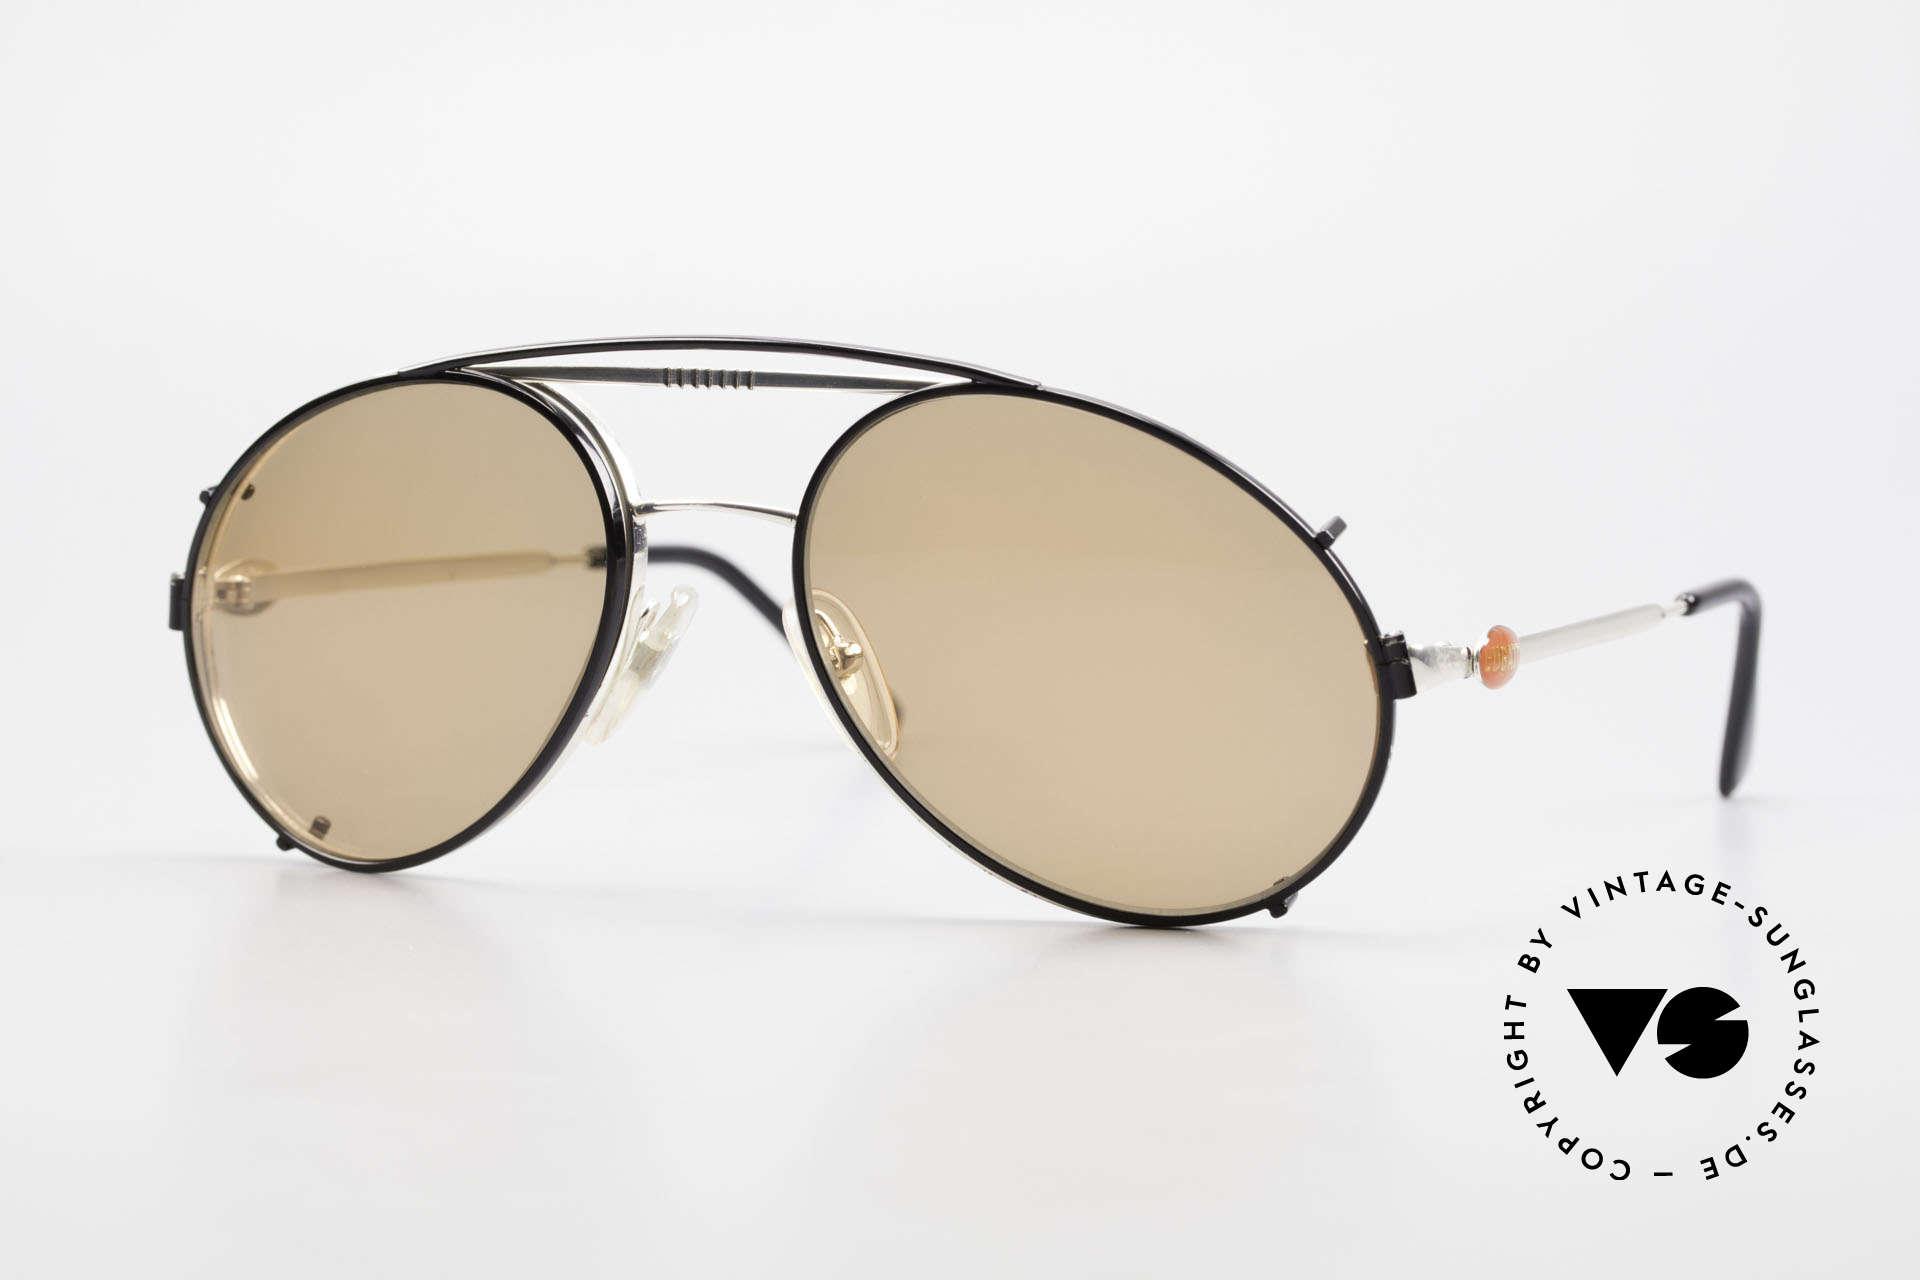 Bugatti 65996 Vintage Frame With Clip On, rare VINTAGE Bugatti 80's luxury sunglasses, Made for Men